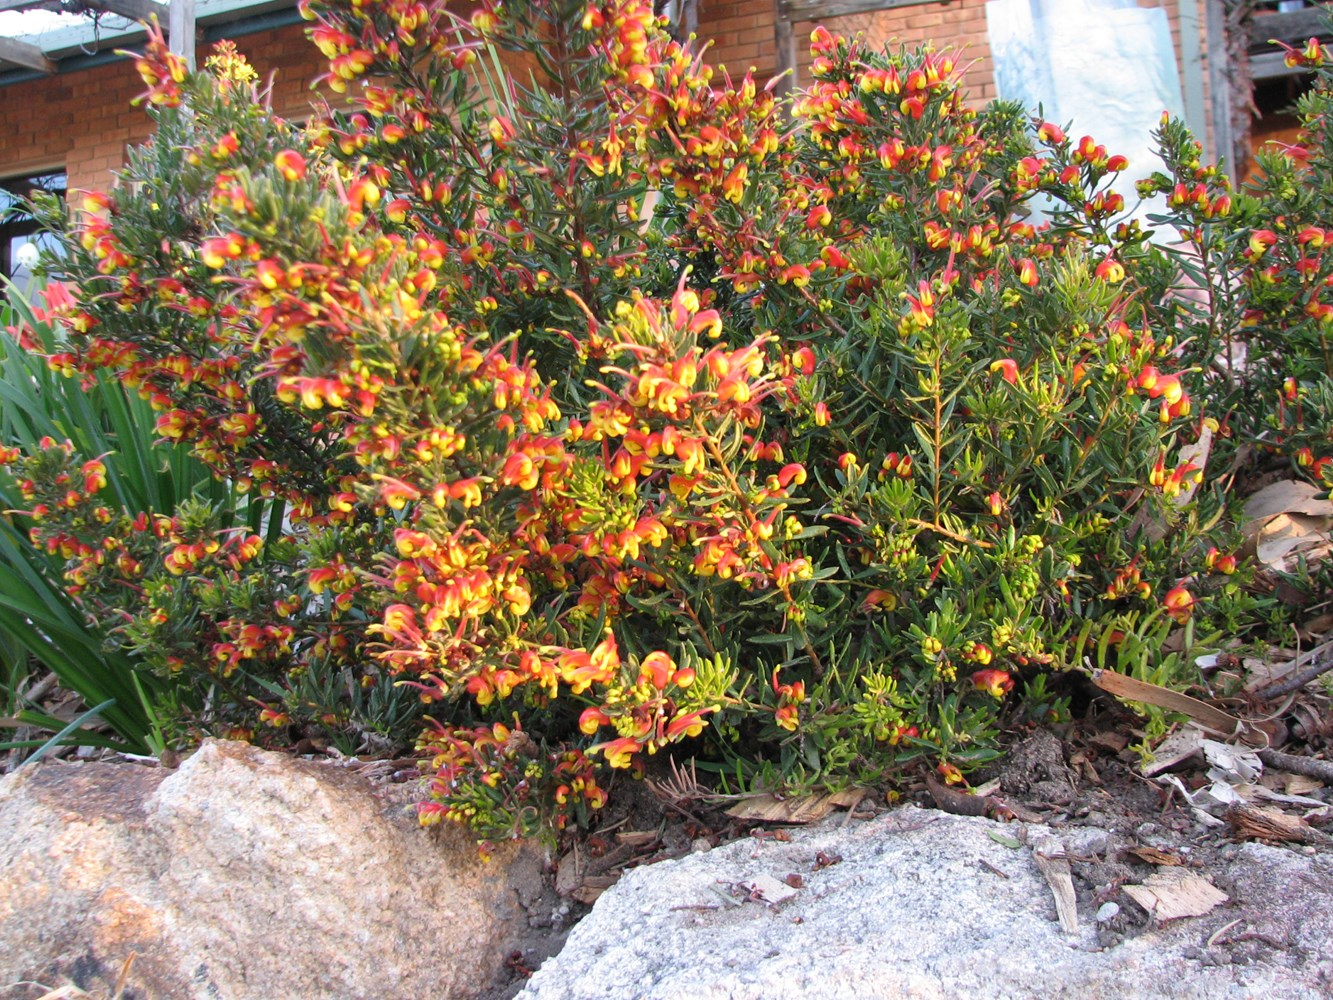 Website/Plants/1652873765/Images/Gallery/g_firecracker_01.0.JPG